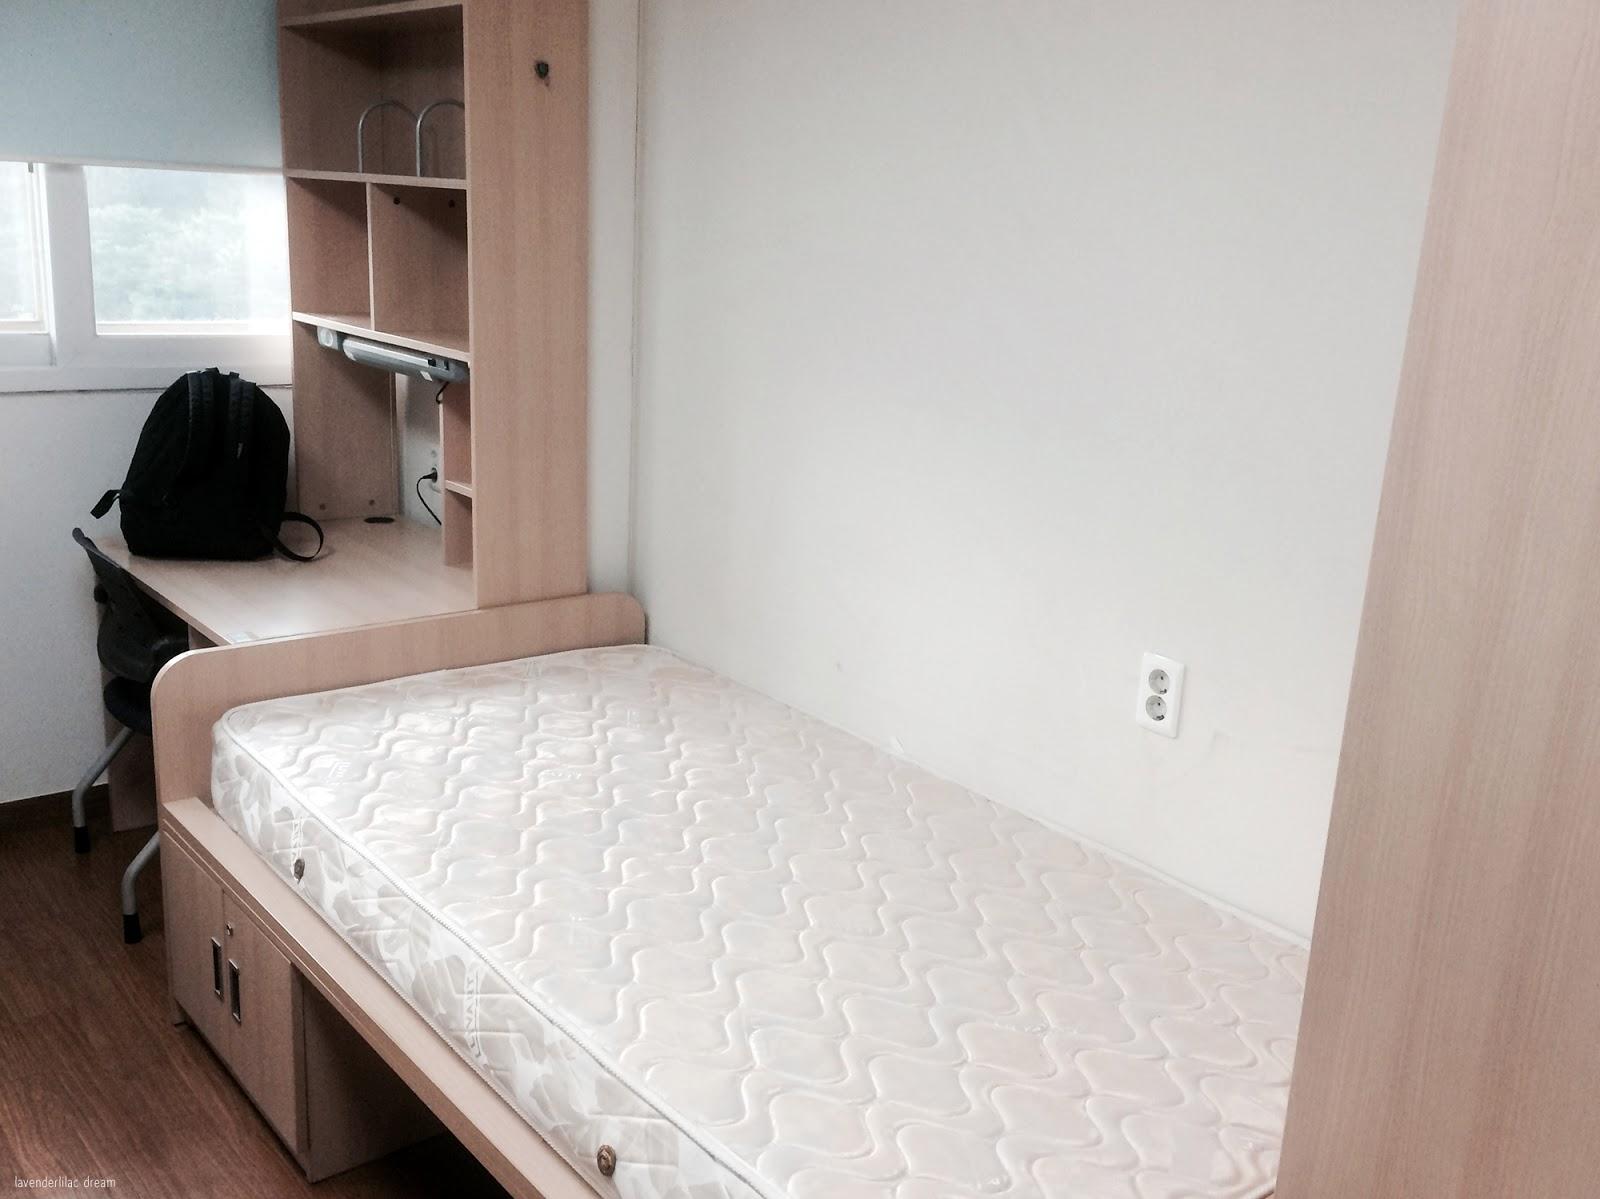 South Korea, Seoul Sinchon, Yonsei University, YISS 2014, SK Global House double dorm room